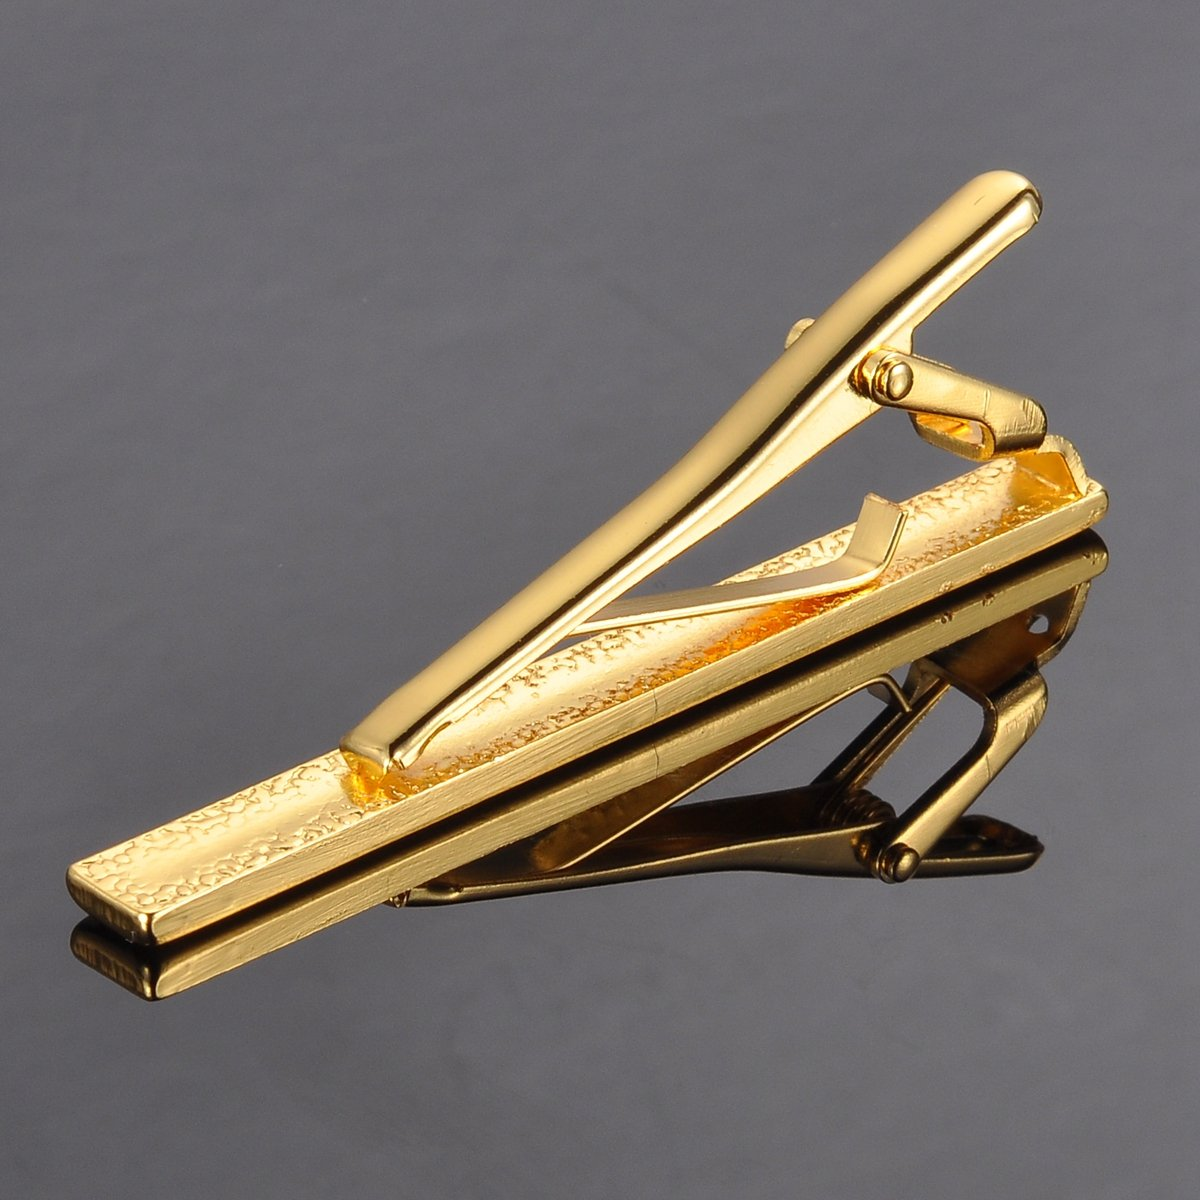 HooAMI Mens Fashion Metal Simple Necktie Tie Bar Clip 2 3/8'' Inch, Gold Plated by HooAMI (Image #2)